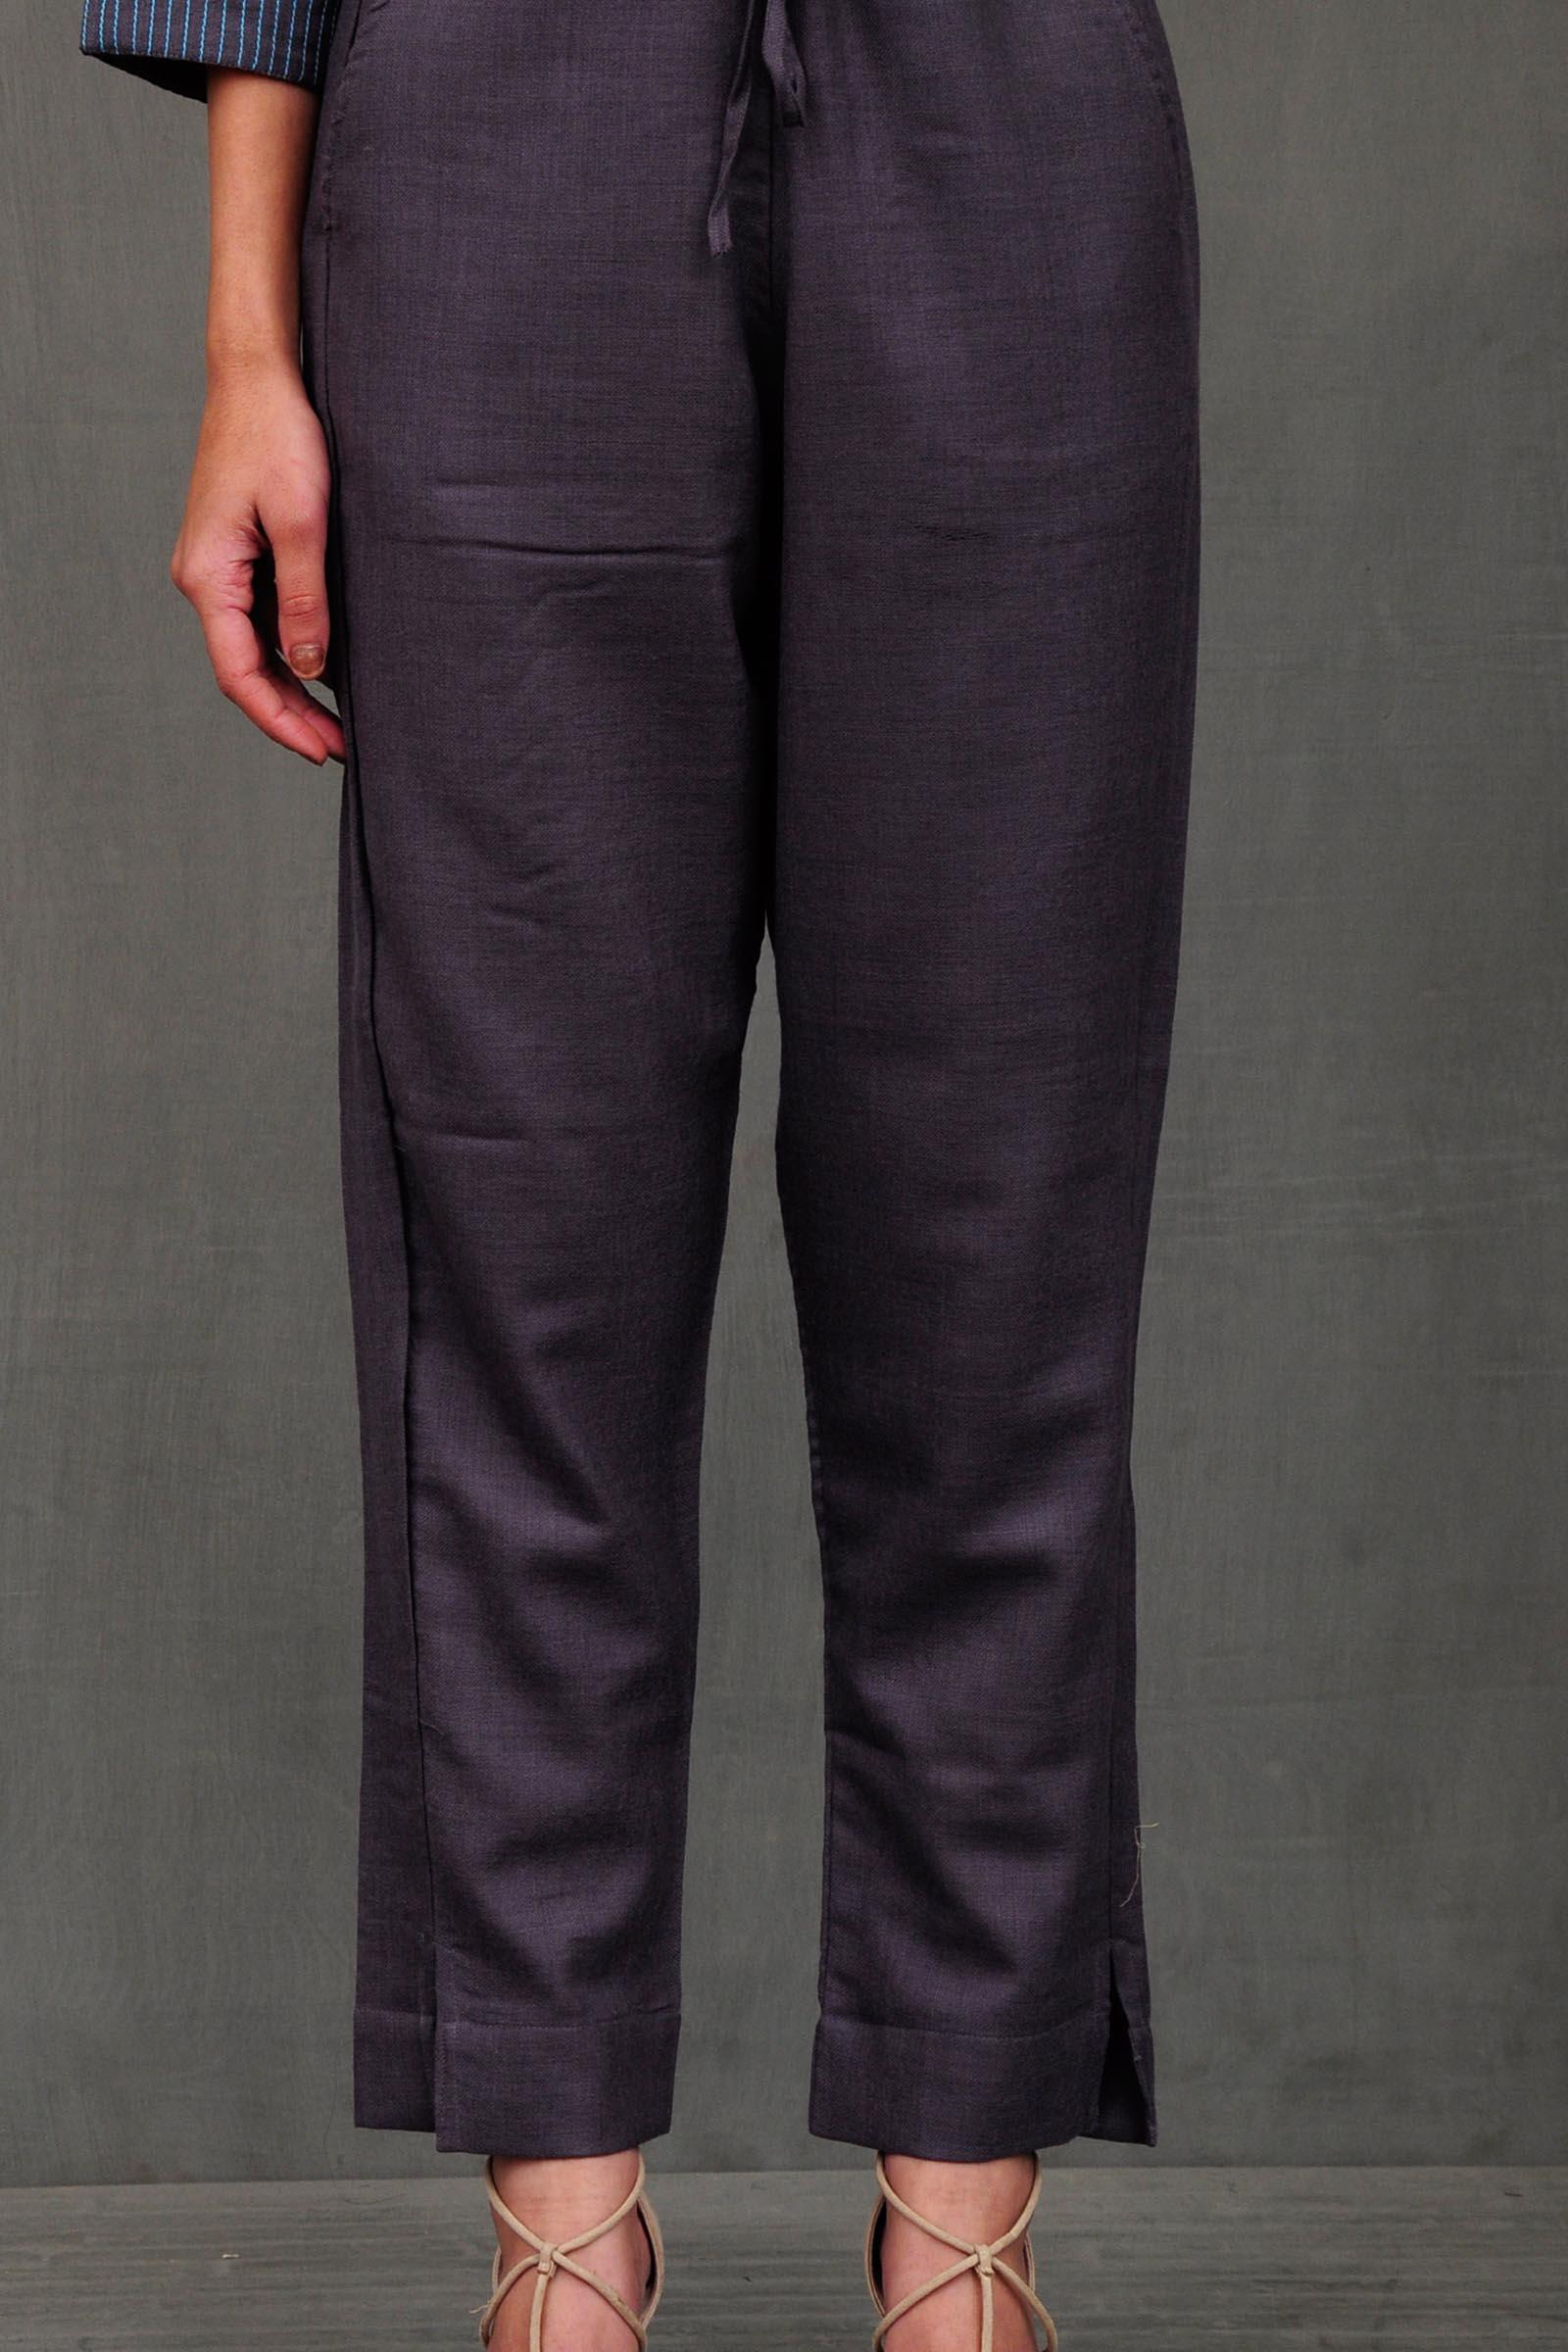 Icy Grey Woolen Cigarette Pant